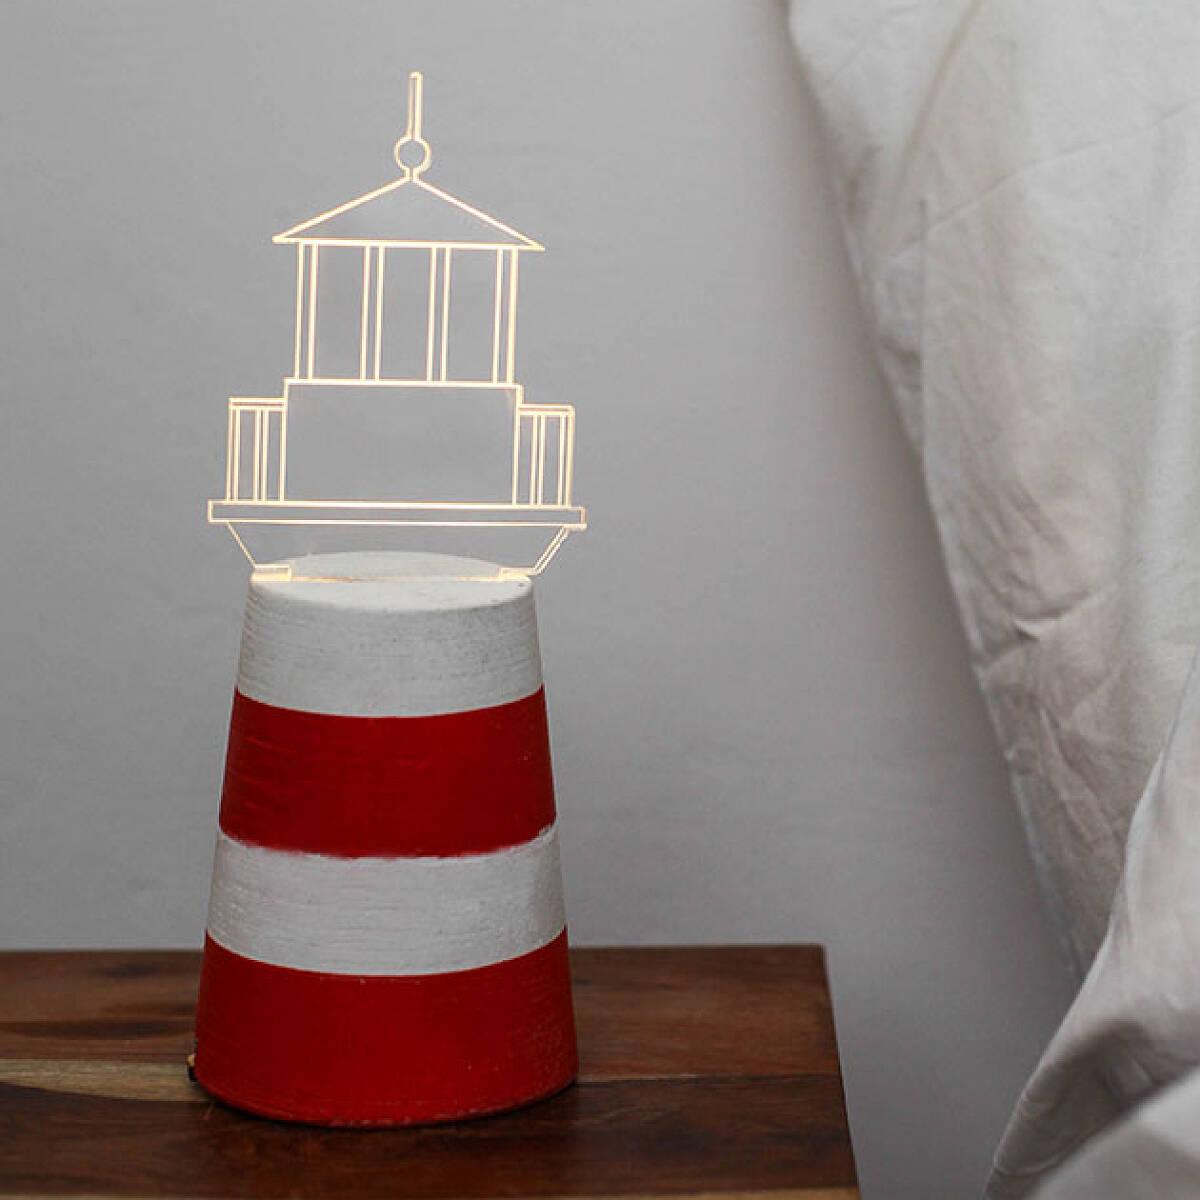 Cottage lighthouse lamp 3 colors - Led Lighthouse Lamp 3 Thumbnail Led Lighthouse Lamp Lighthouse Decor Led Lighting Uncommongoods